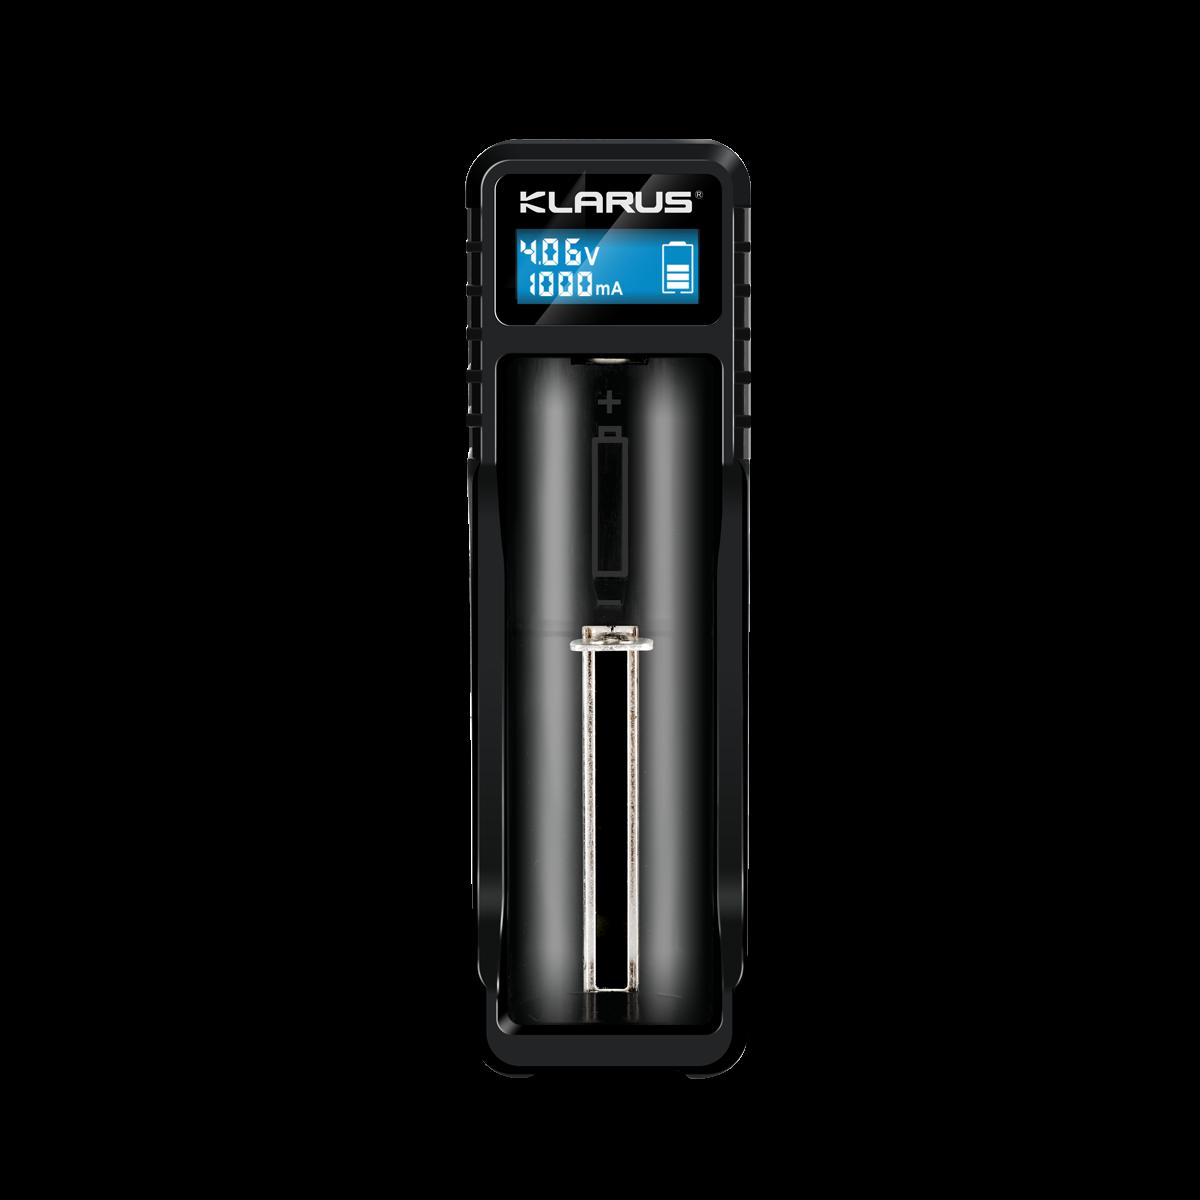 Klarus K1X, 1 Schacht USB Ladegerät mit Powerbank Funktion